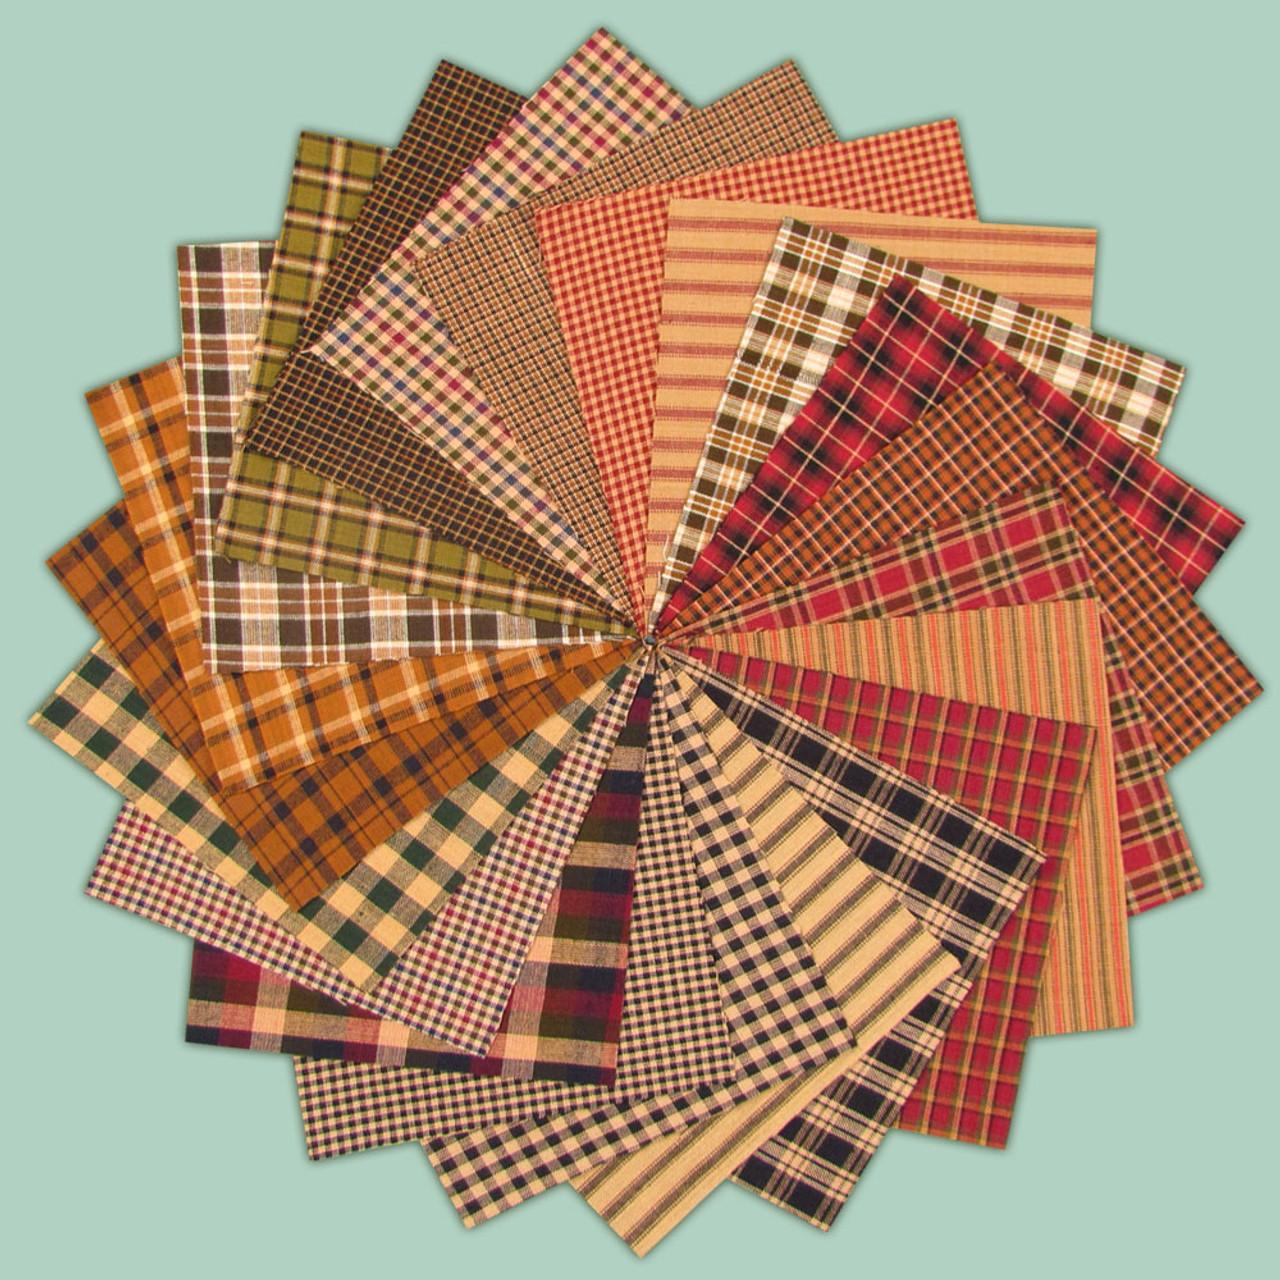 Rustic Primitive Ragged Homespun Quilt Kit